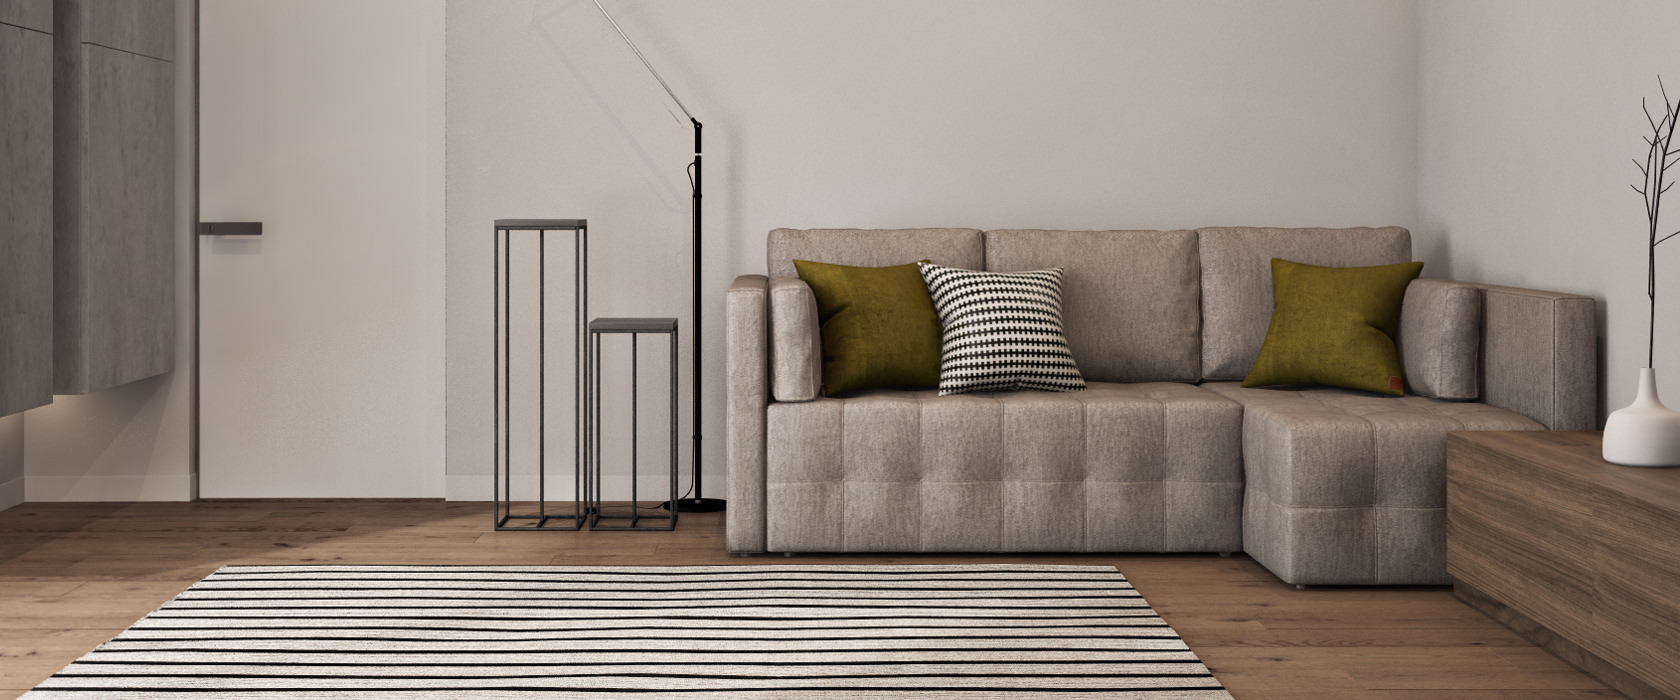 Кутовий диван Sofia - Фото 2 - Pufetto